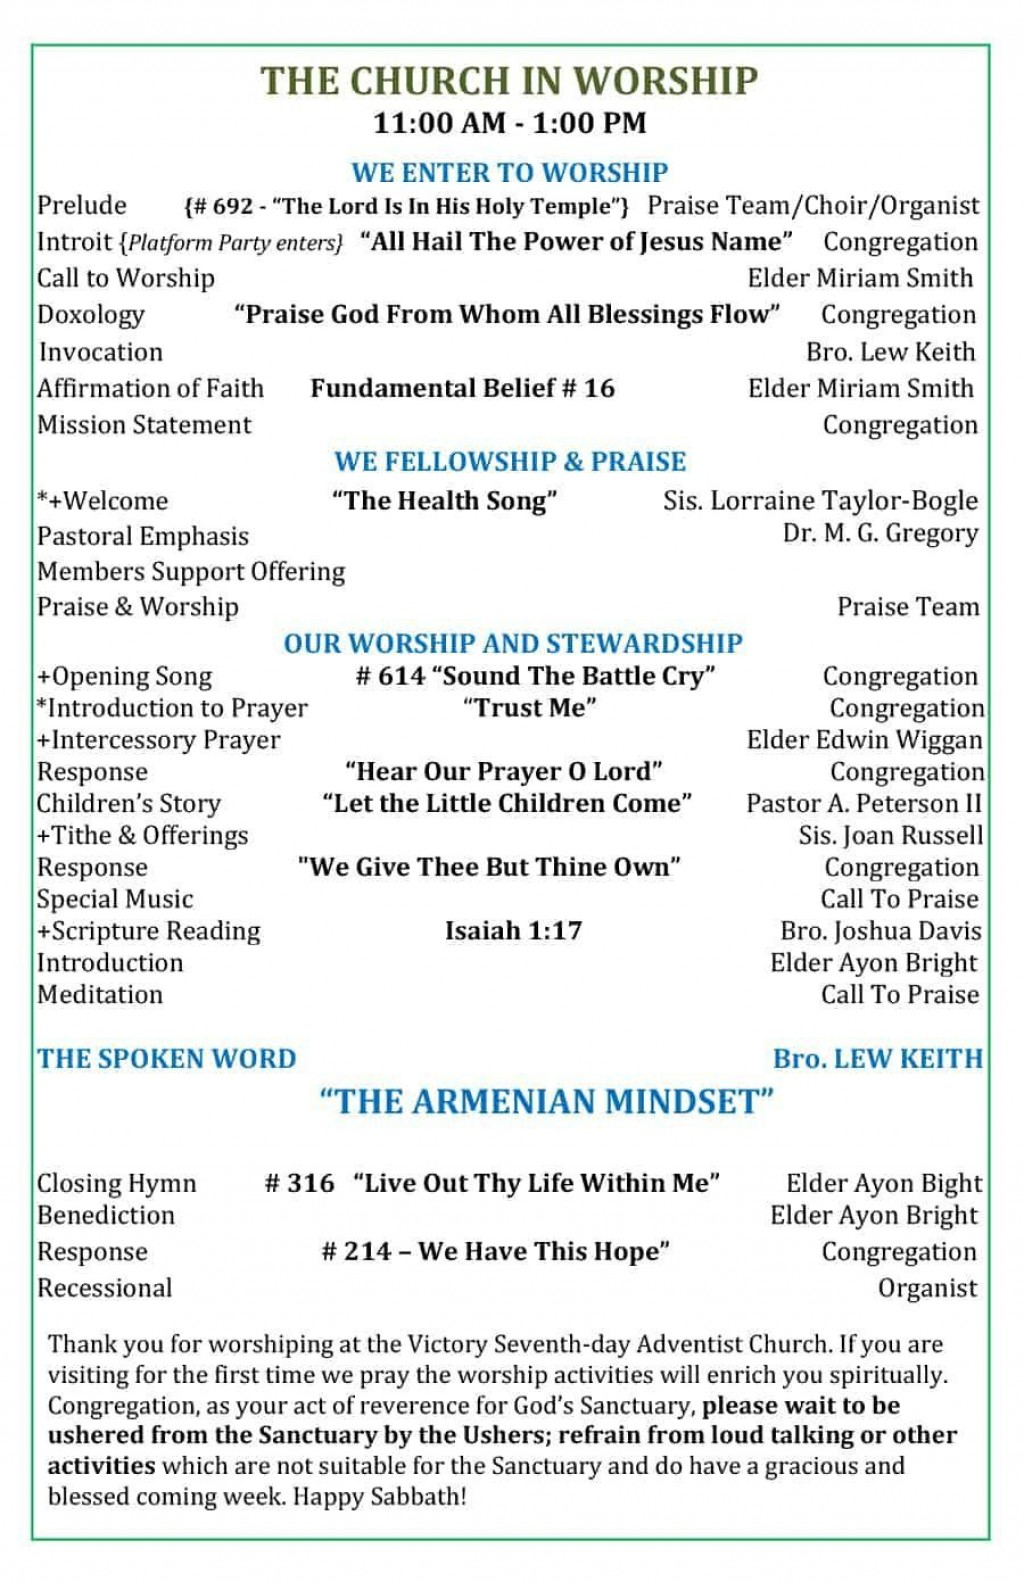 001 Excellent Free Church Program Template Download Concept  DownloadsLarge